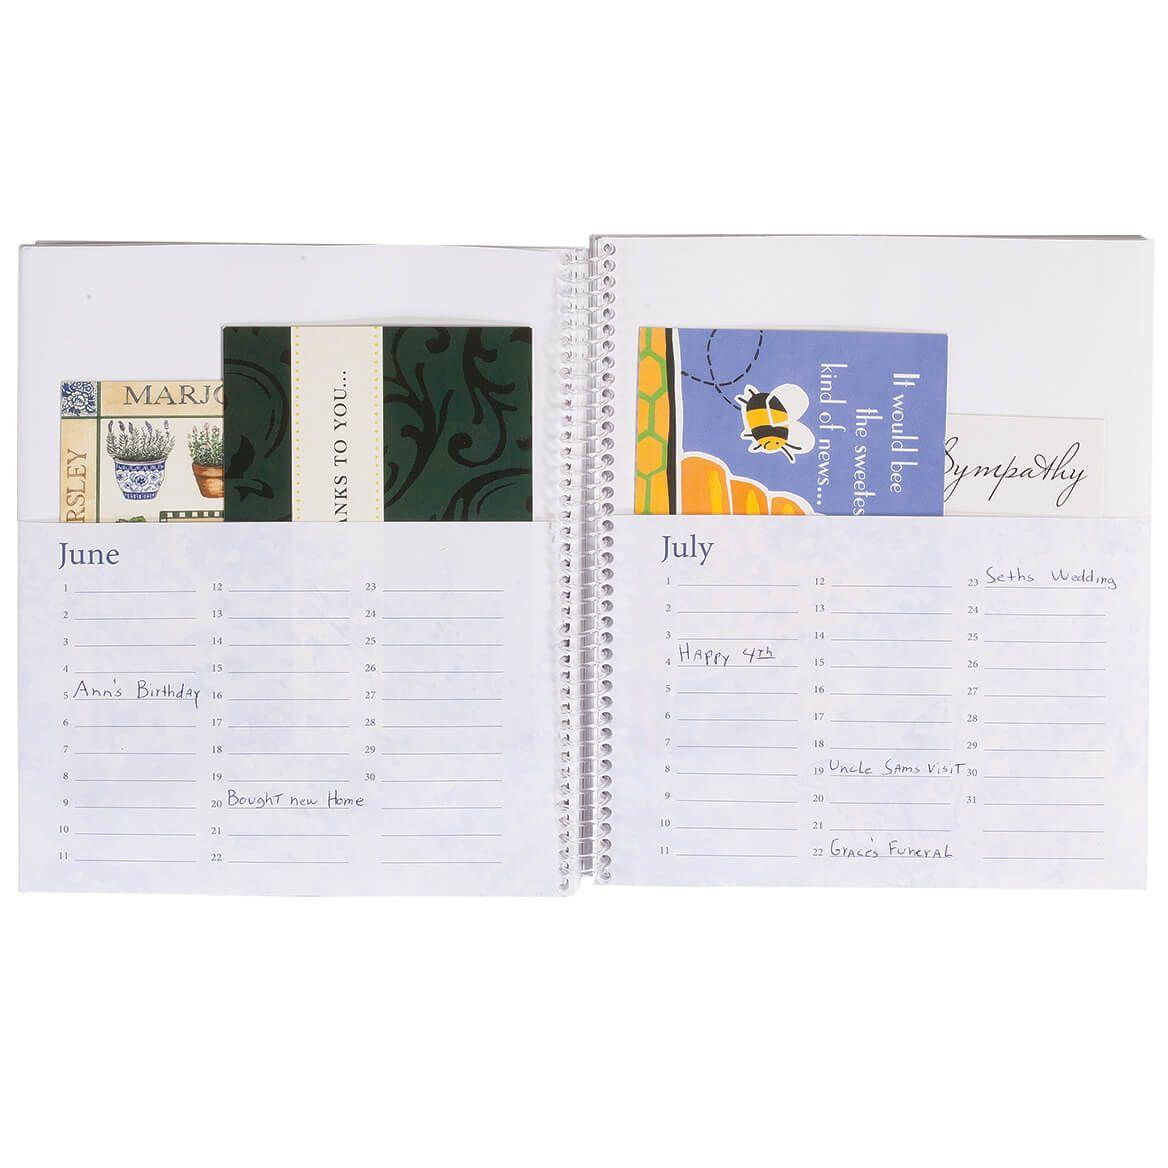 Greeting Cards Organizer-364662